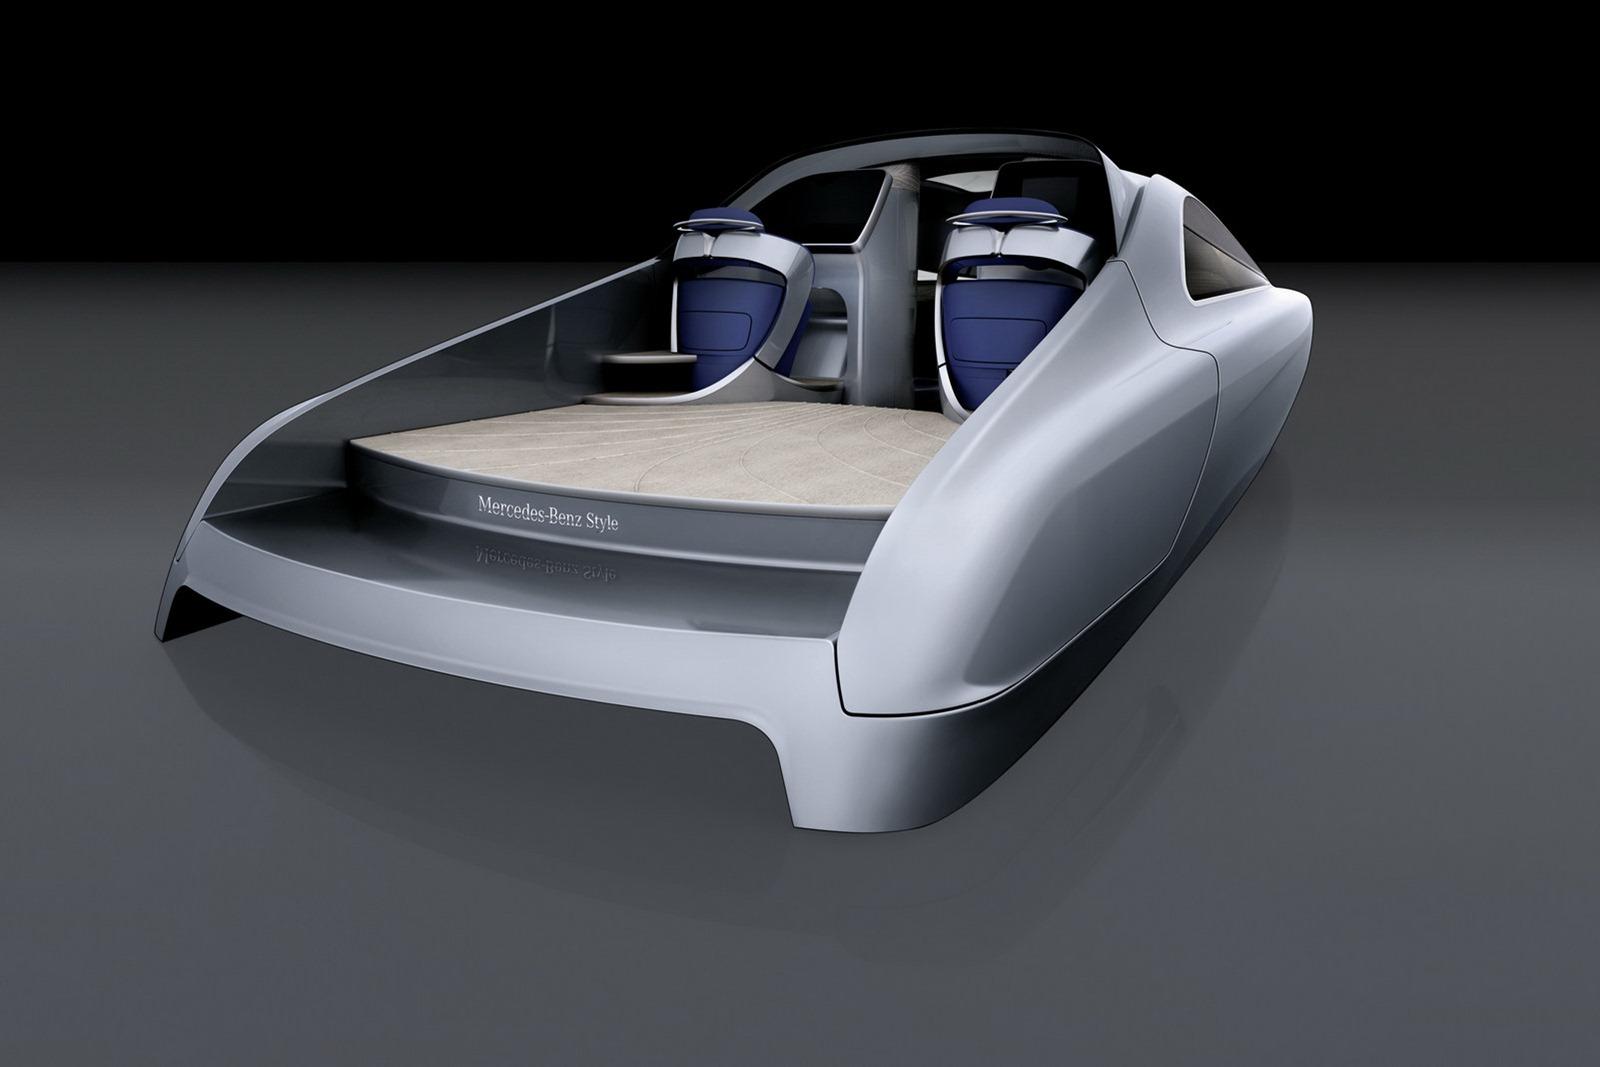 Mercedes-Benz-Style-Yacht-4